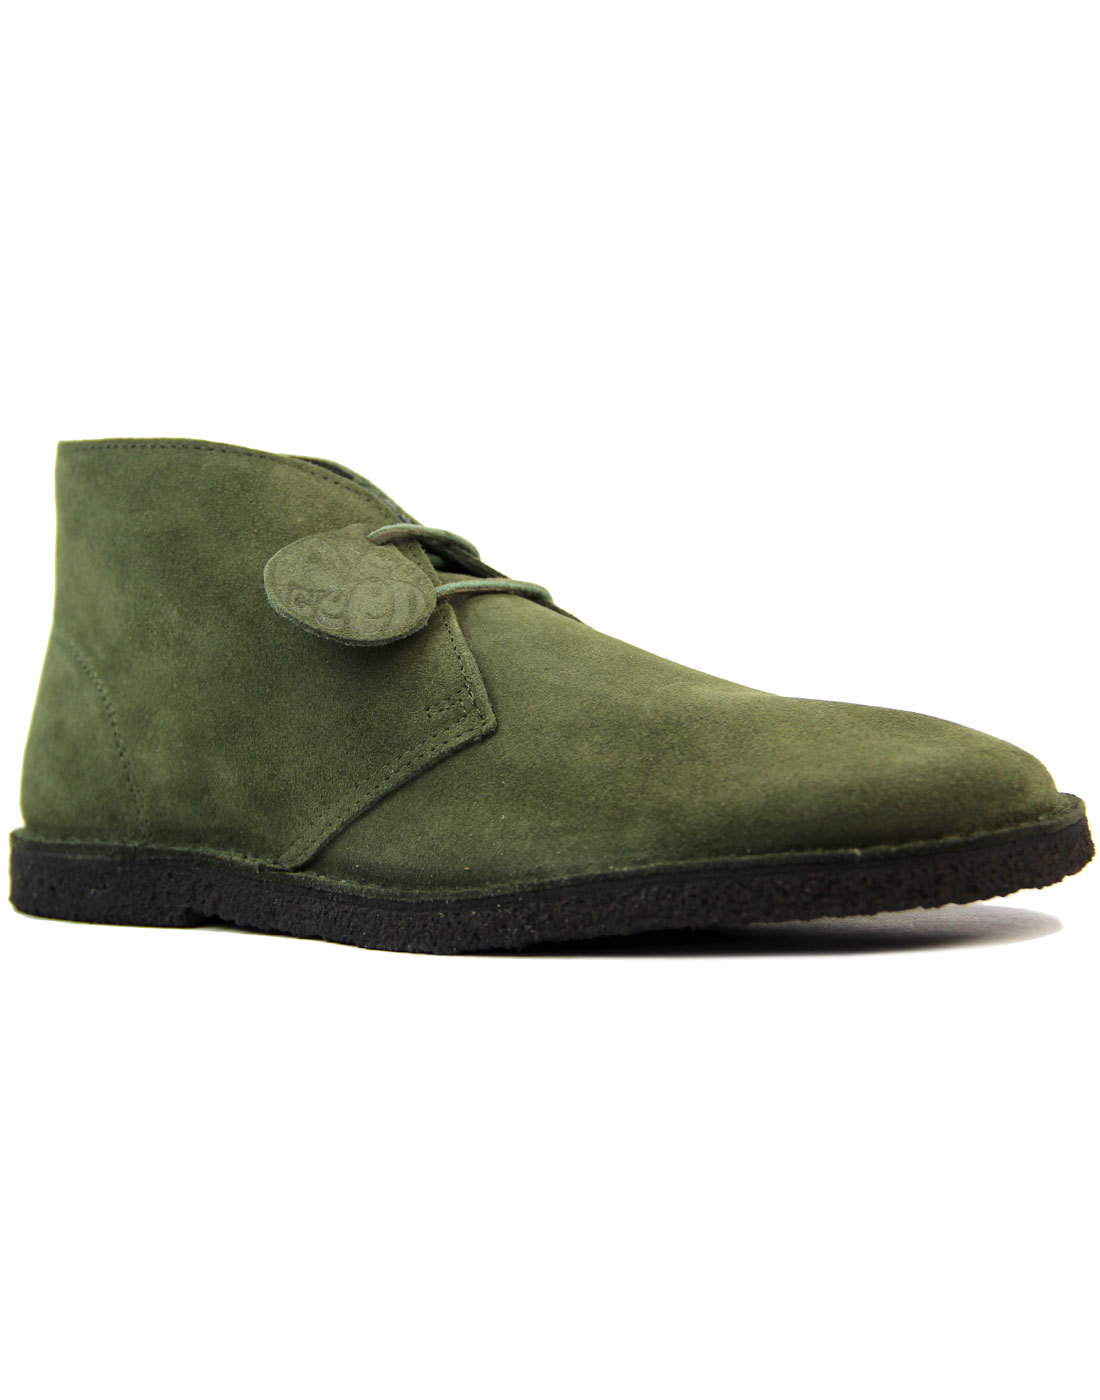 PRETTY GREEN Retro Mod Khaki Suede Desert Boots